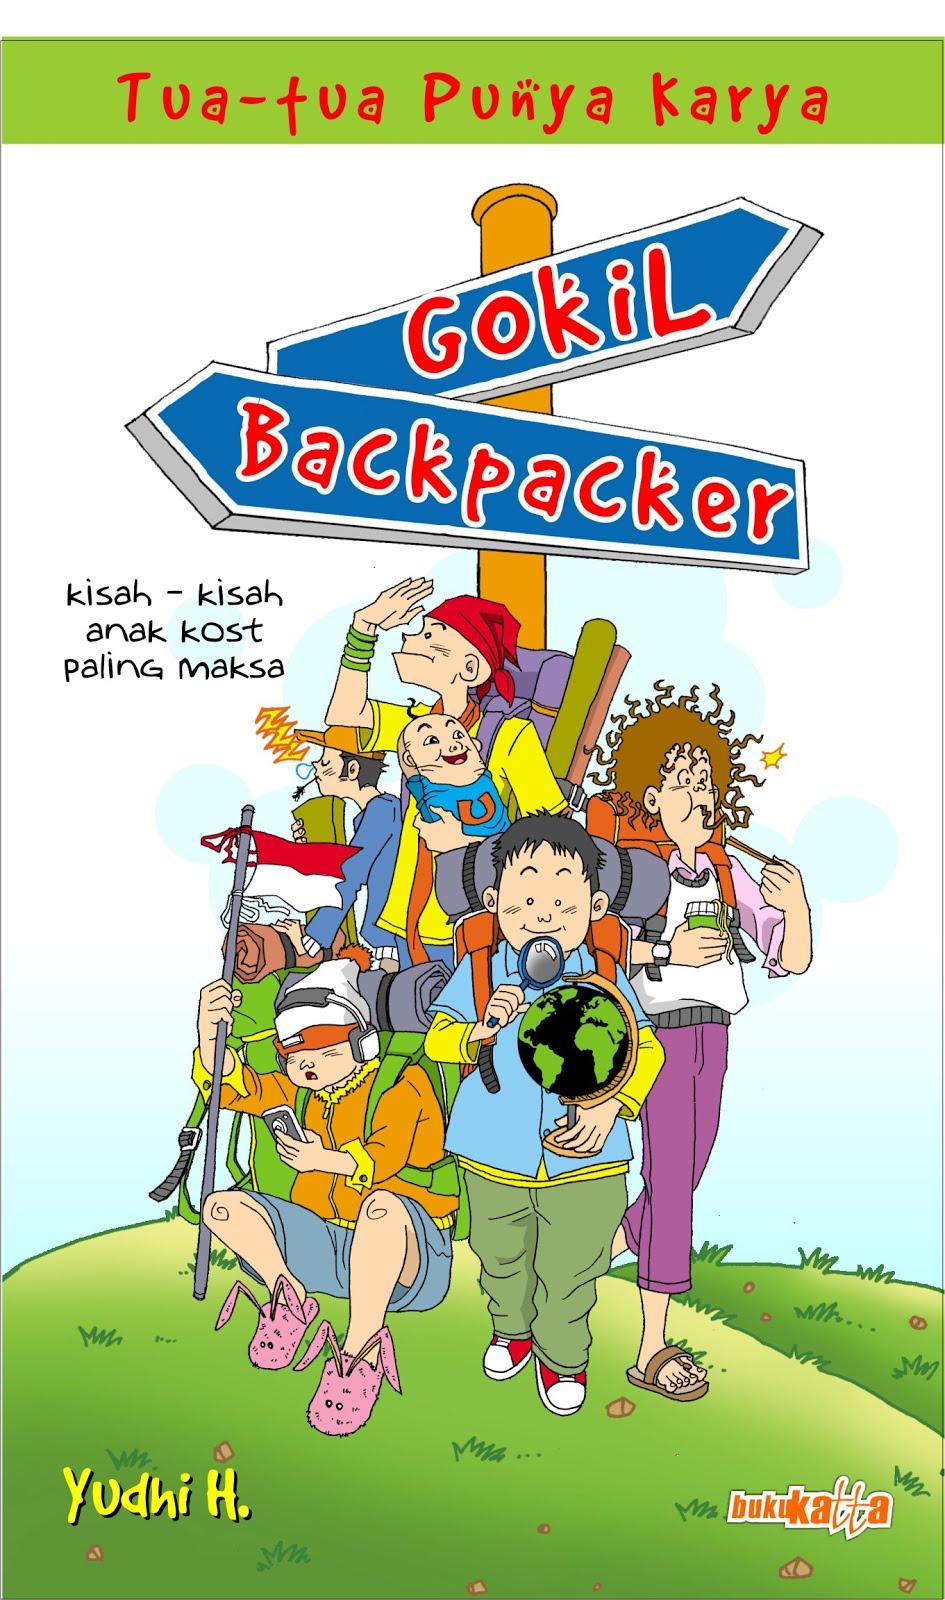 Gokil Backpacker, kisah-kisah anak kost paling maksa